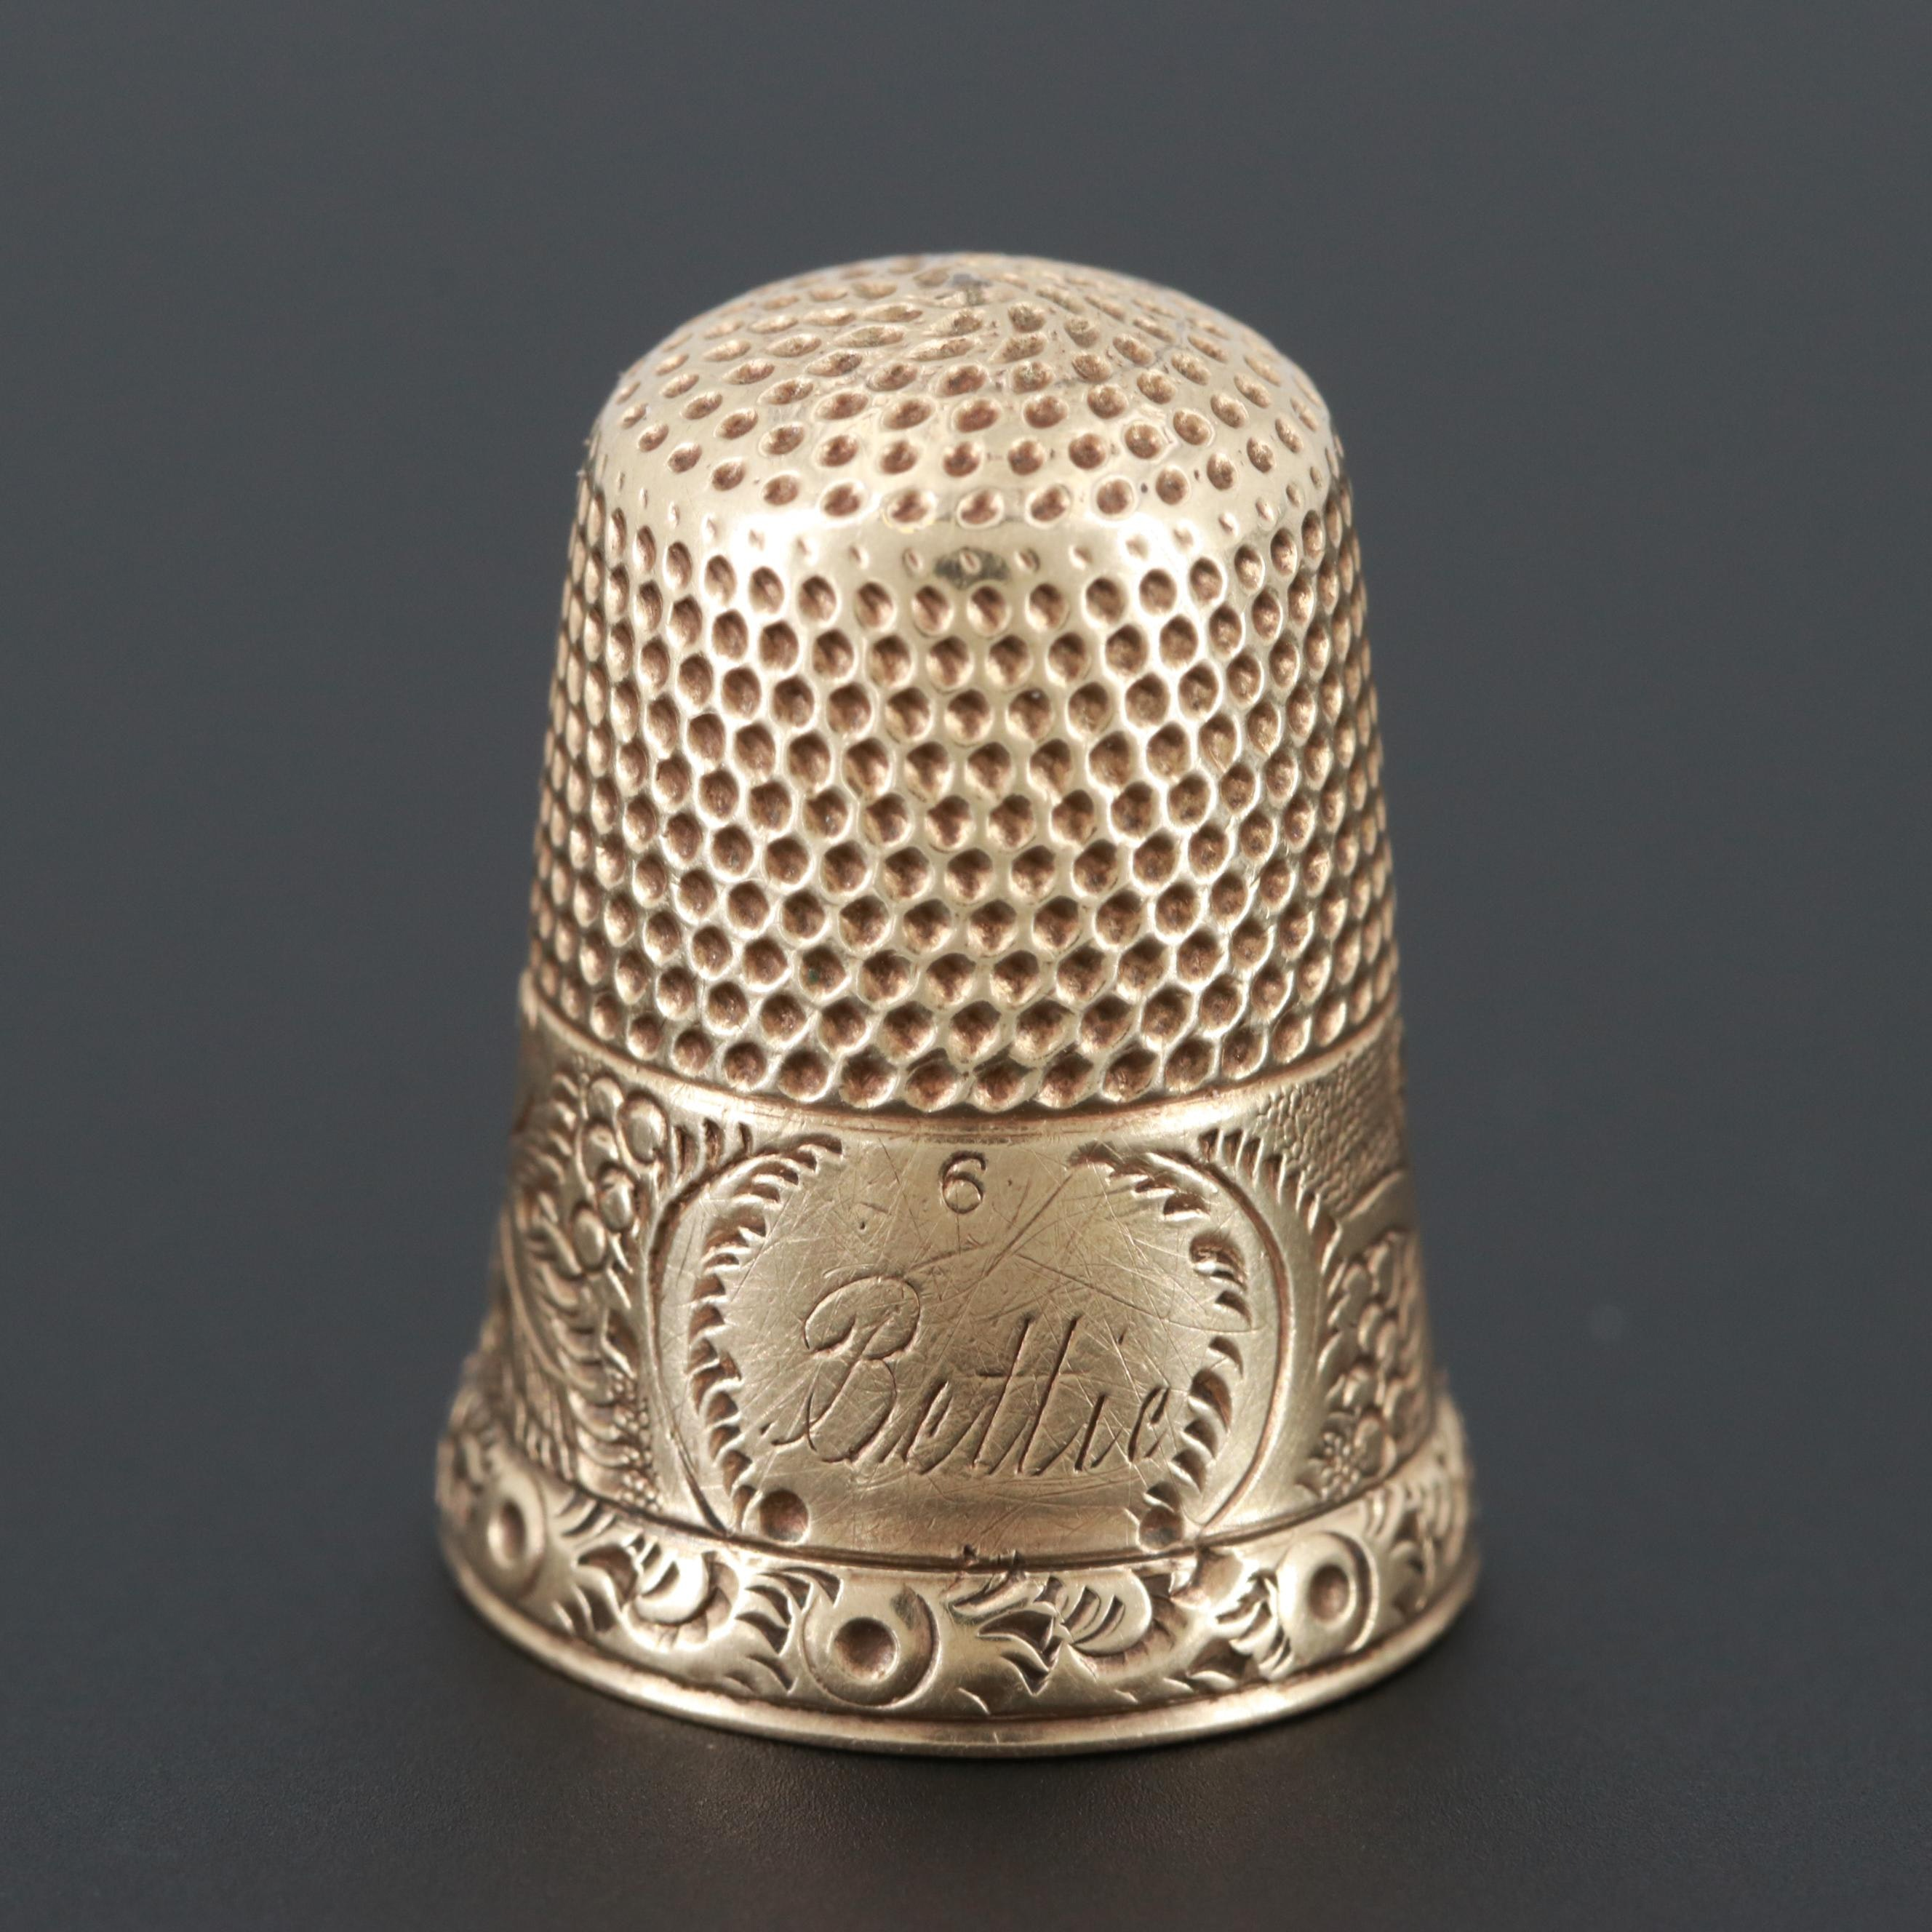 Vintage 14K Yellow Gold Engraved Thimble